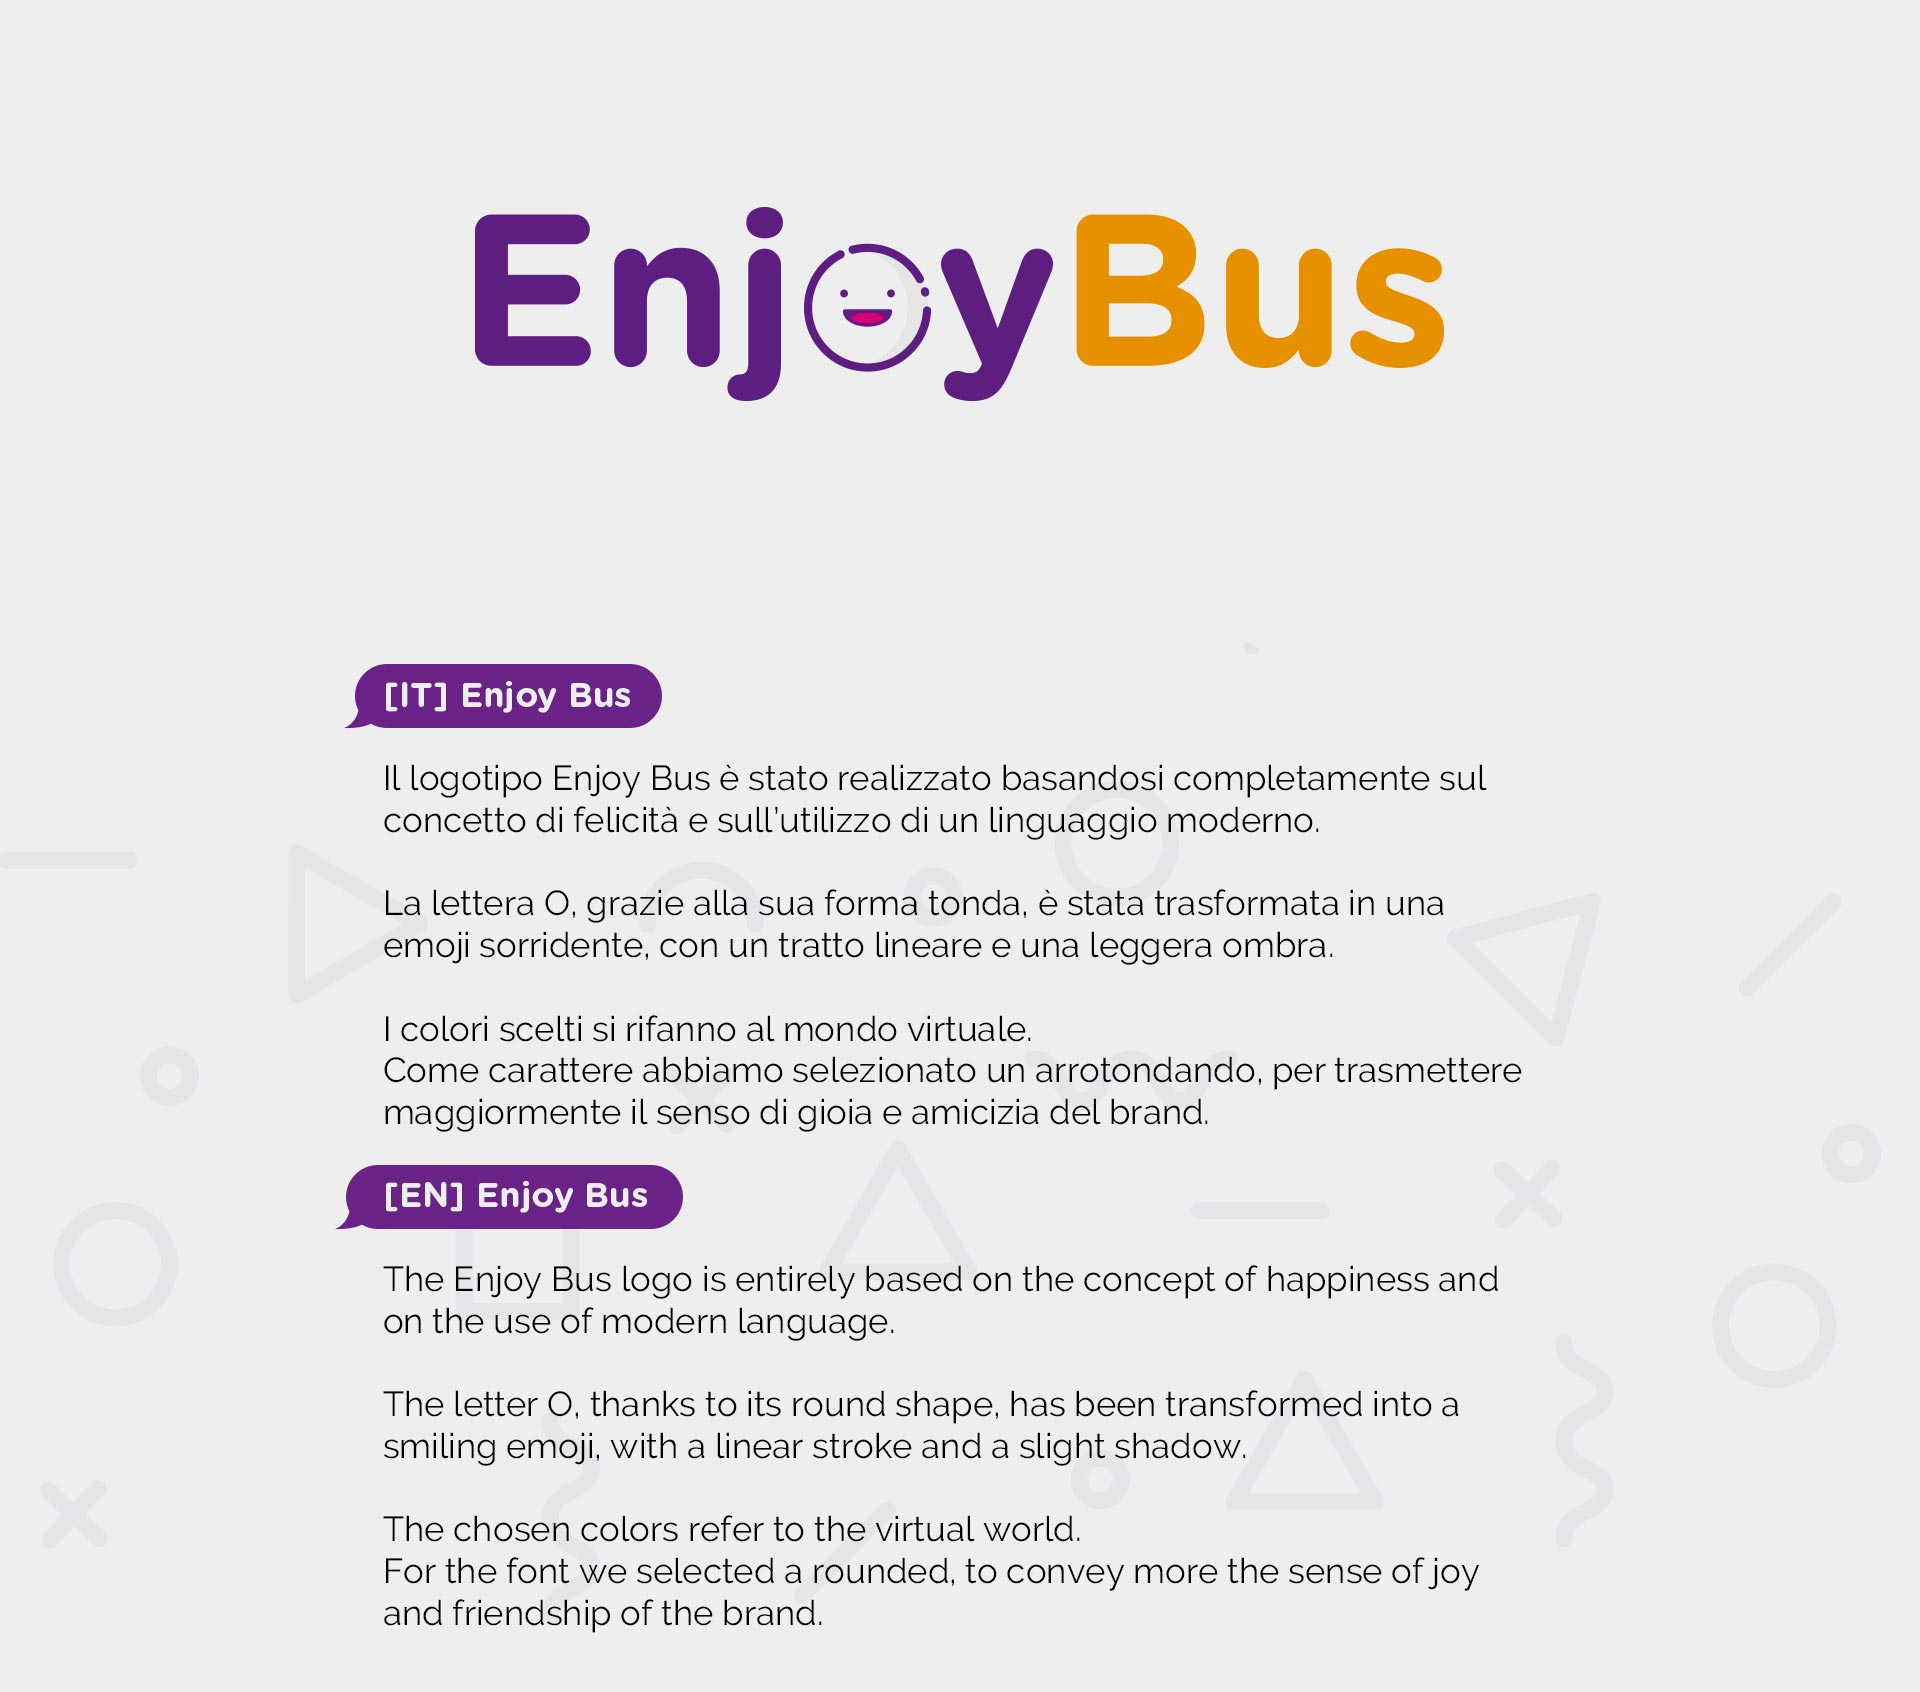 Enjoy Bus Brand Image // Fabiano Bortolami